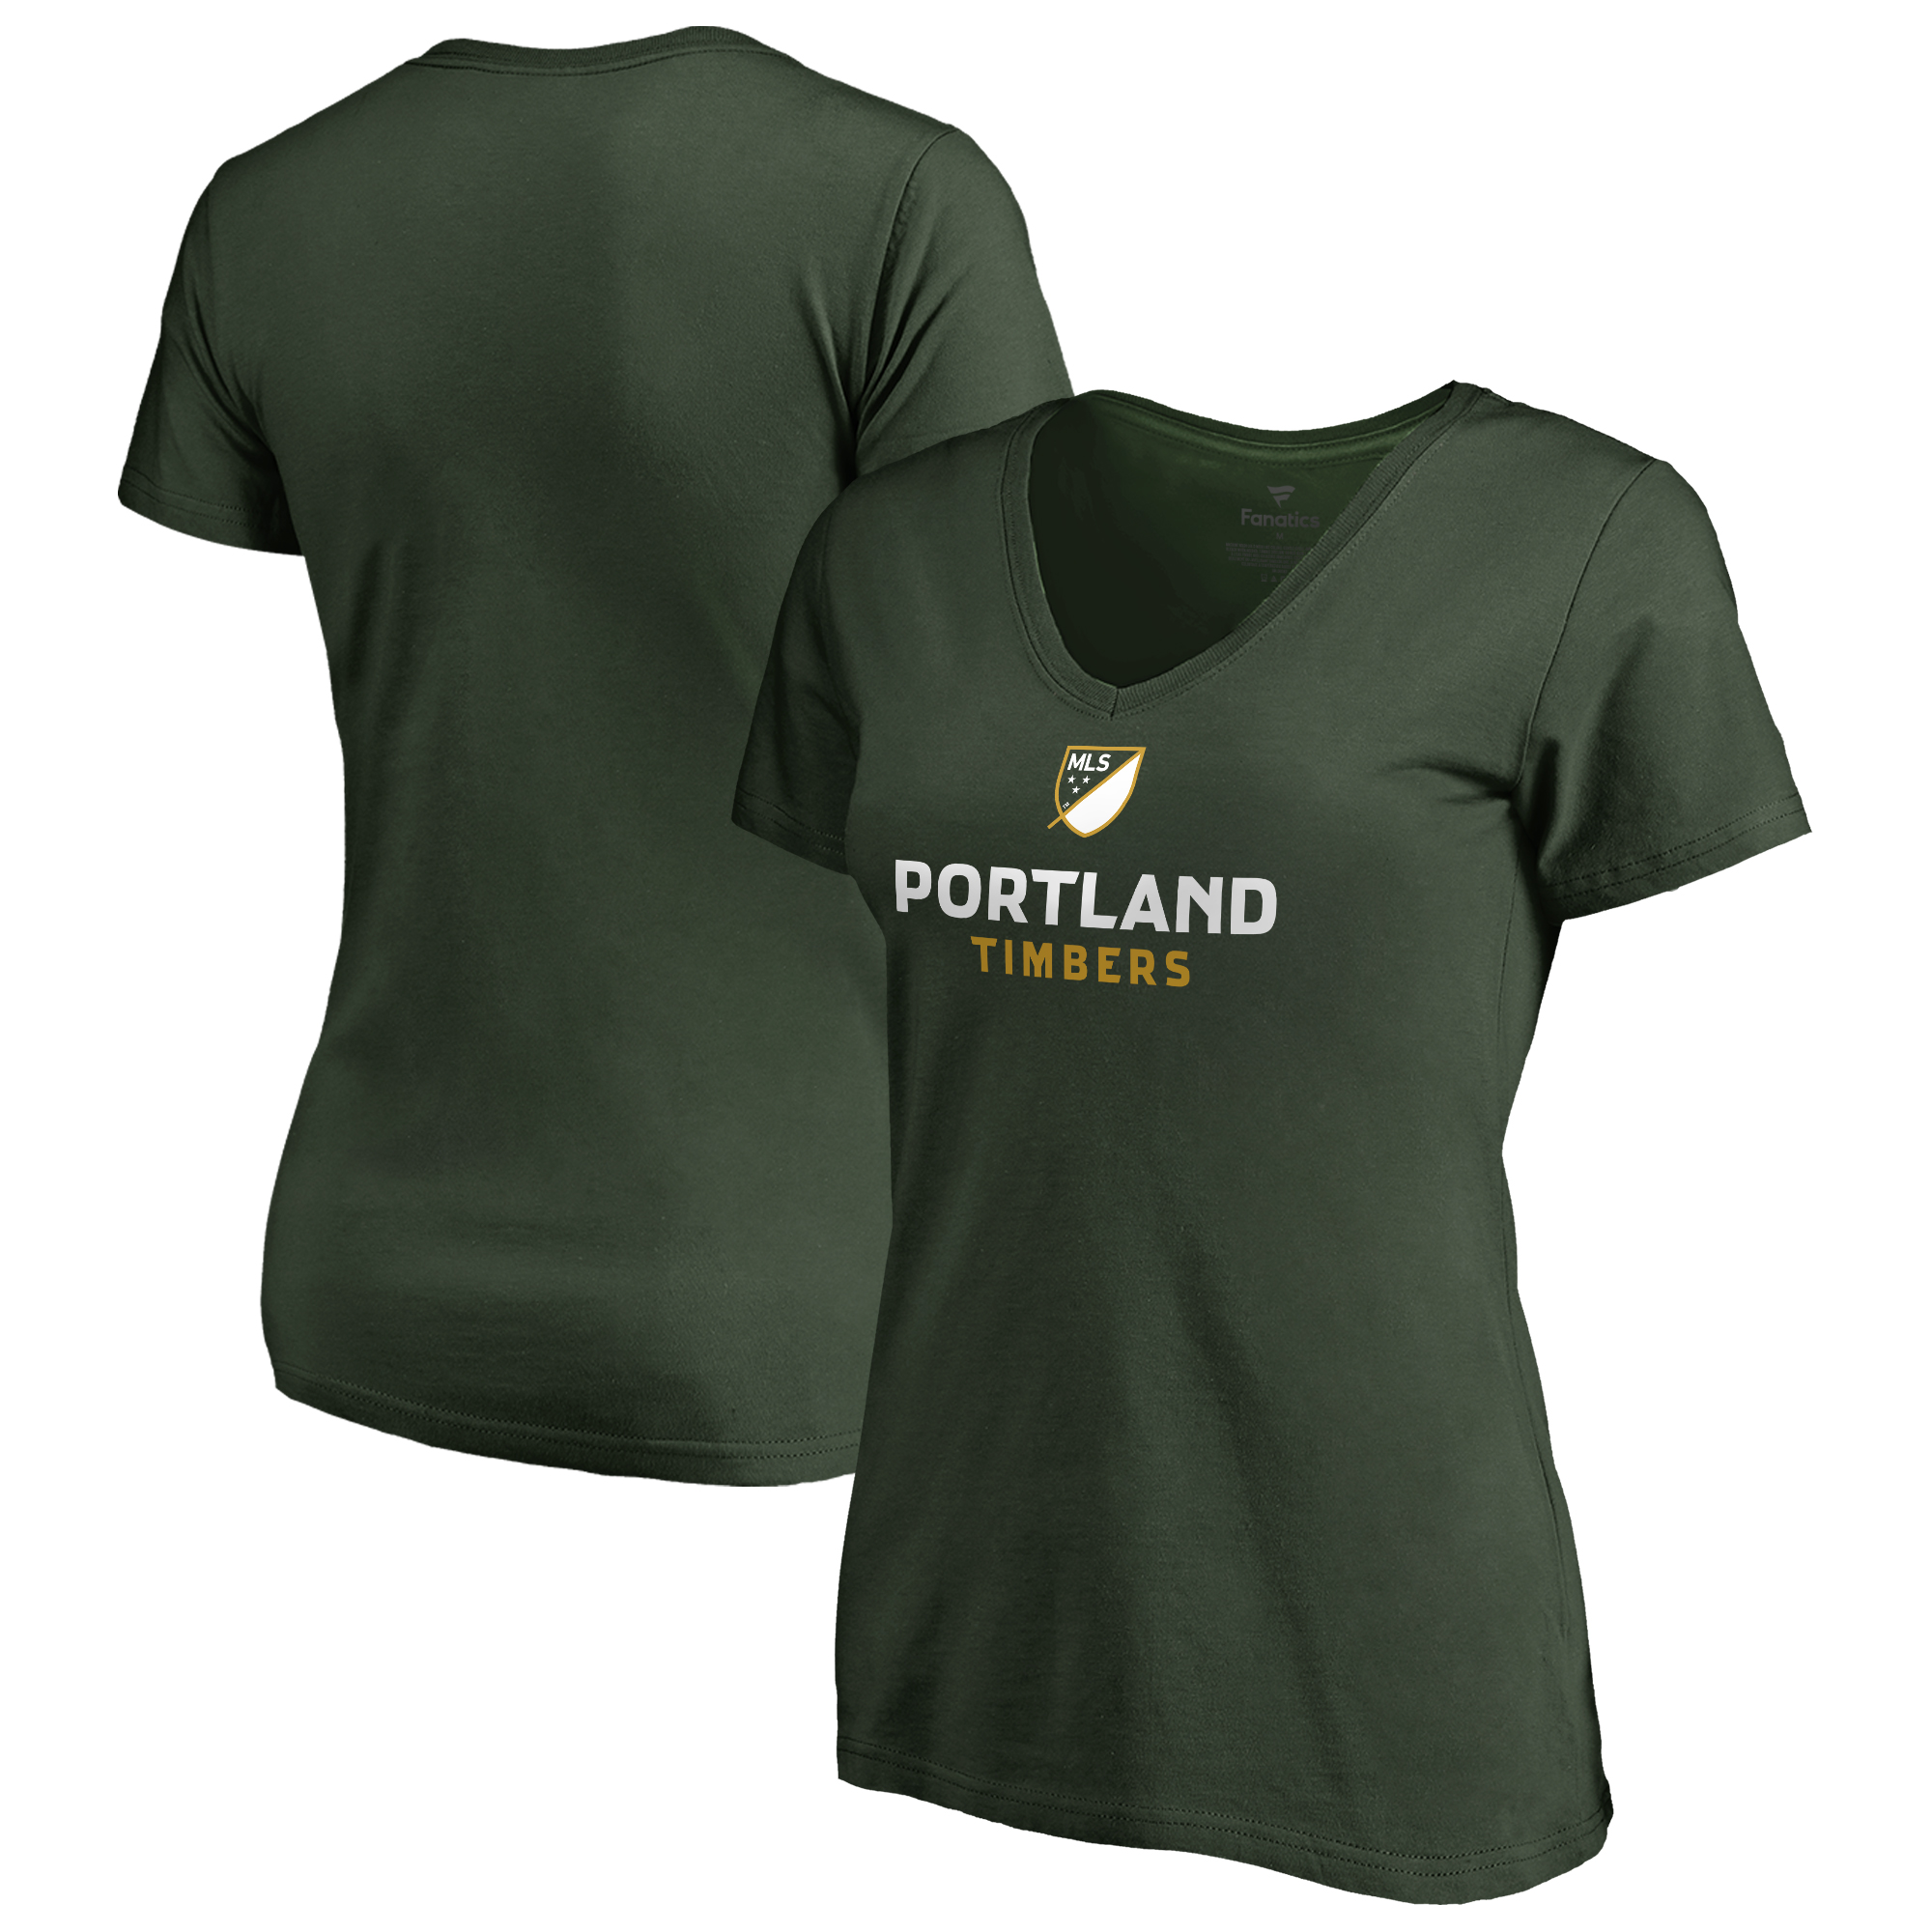 Portland Timbers Fanatics Branded Women's Shielded V-Neck T-Shirt - Green